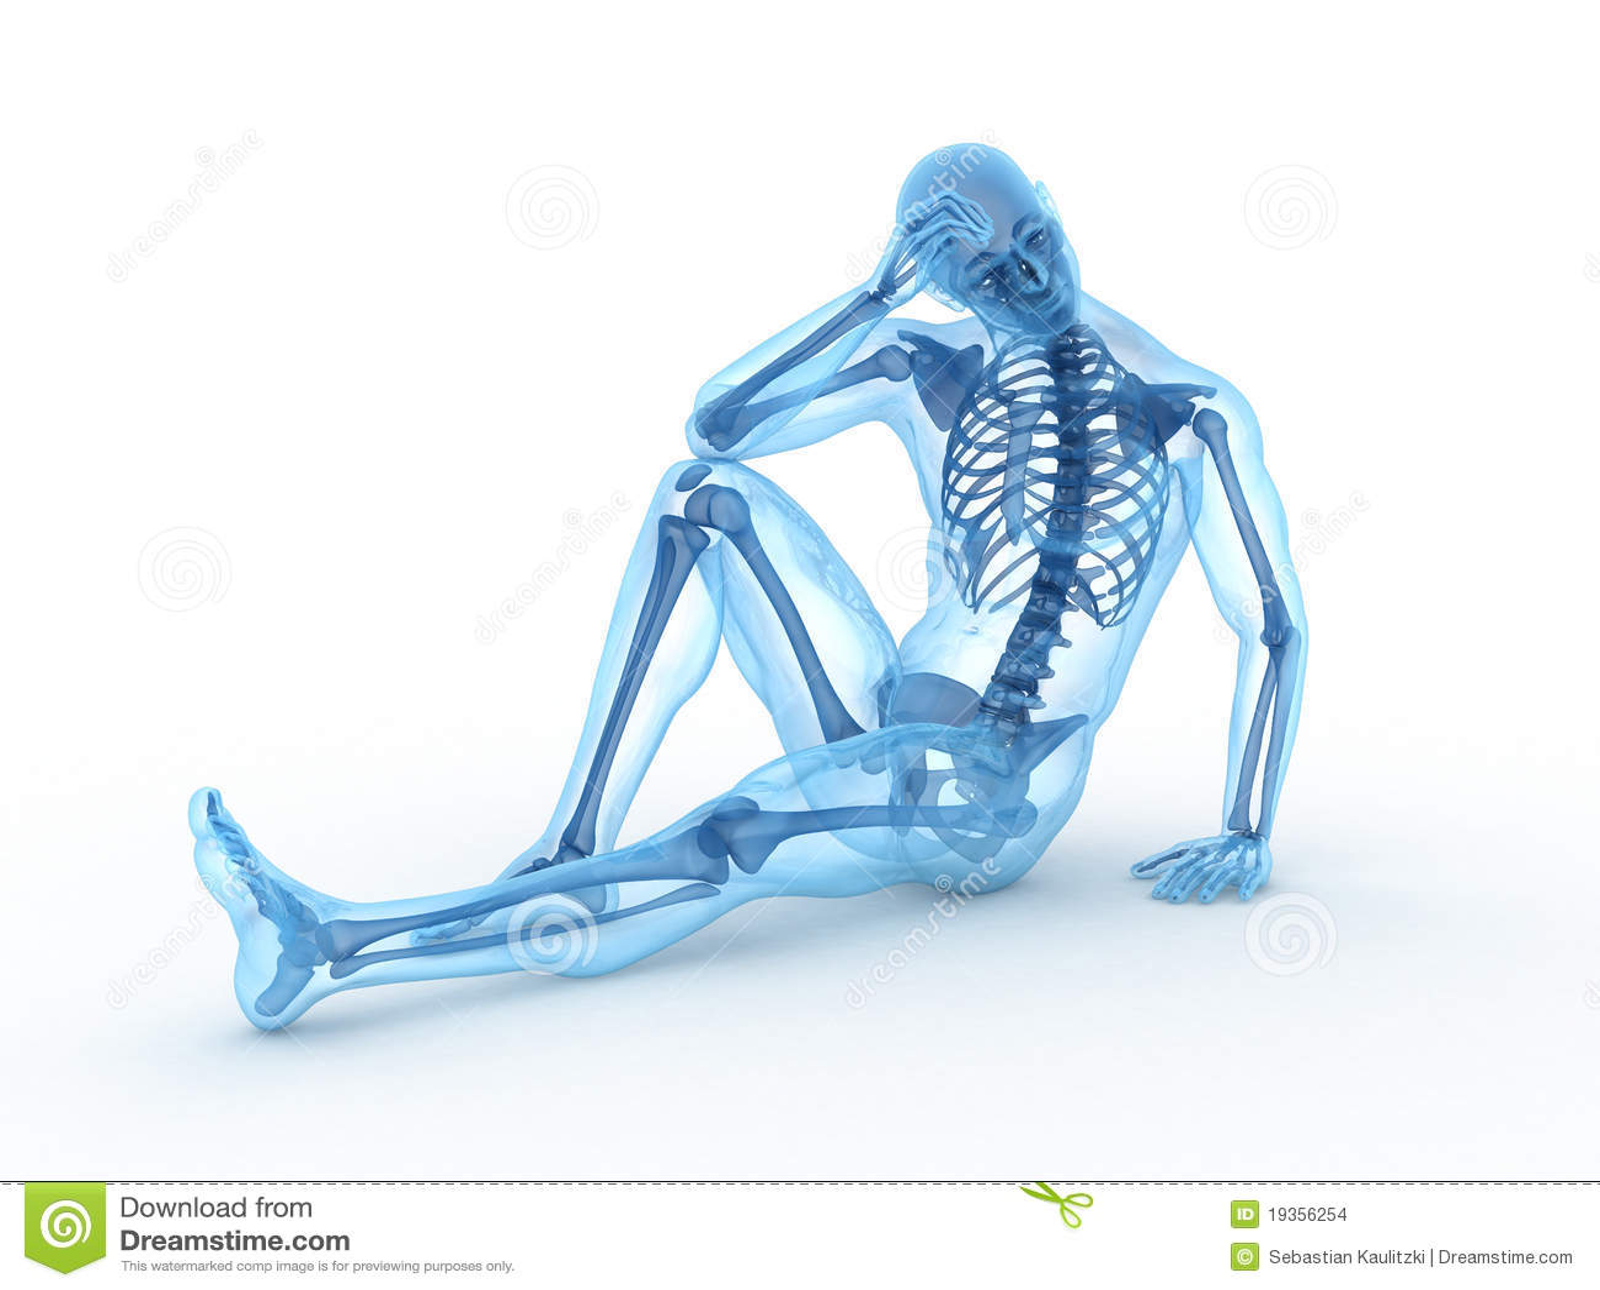 Orthopedic Skeleton Sitting male skeleton